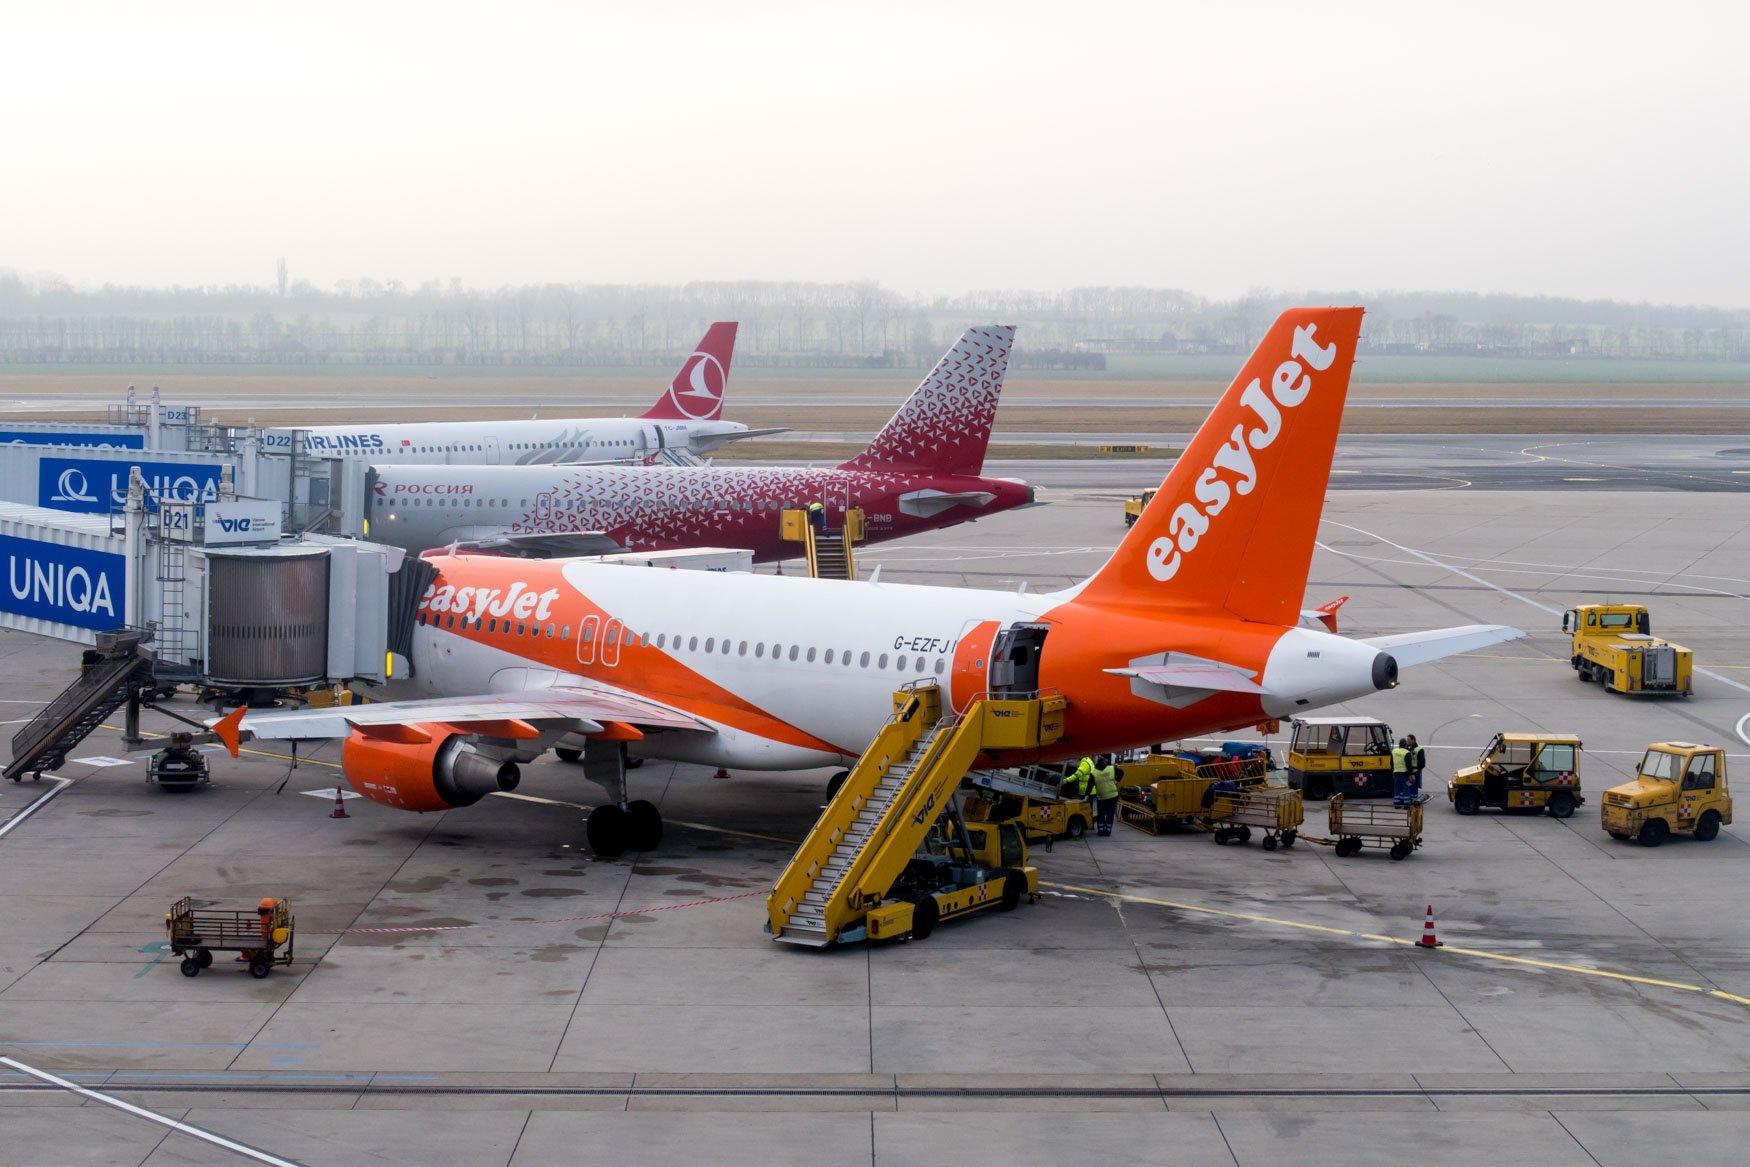 How Fast Do Passenger Jets Fly?